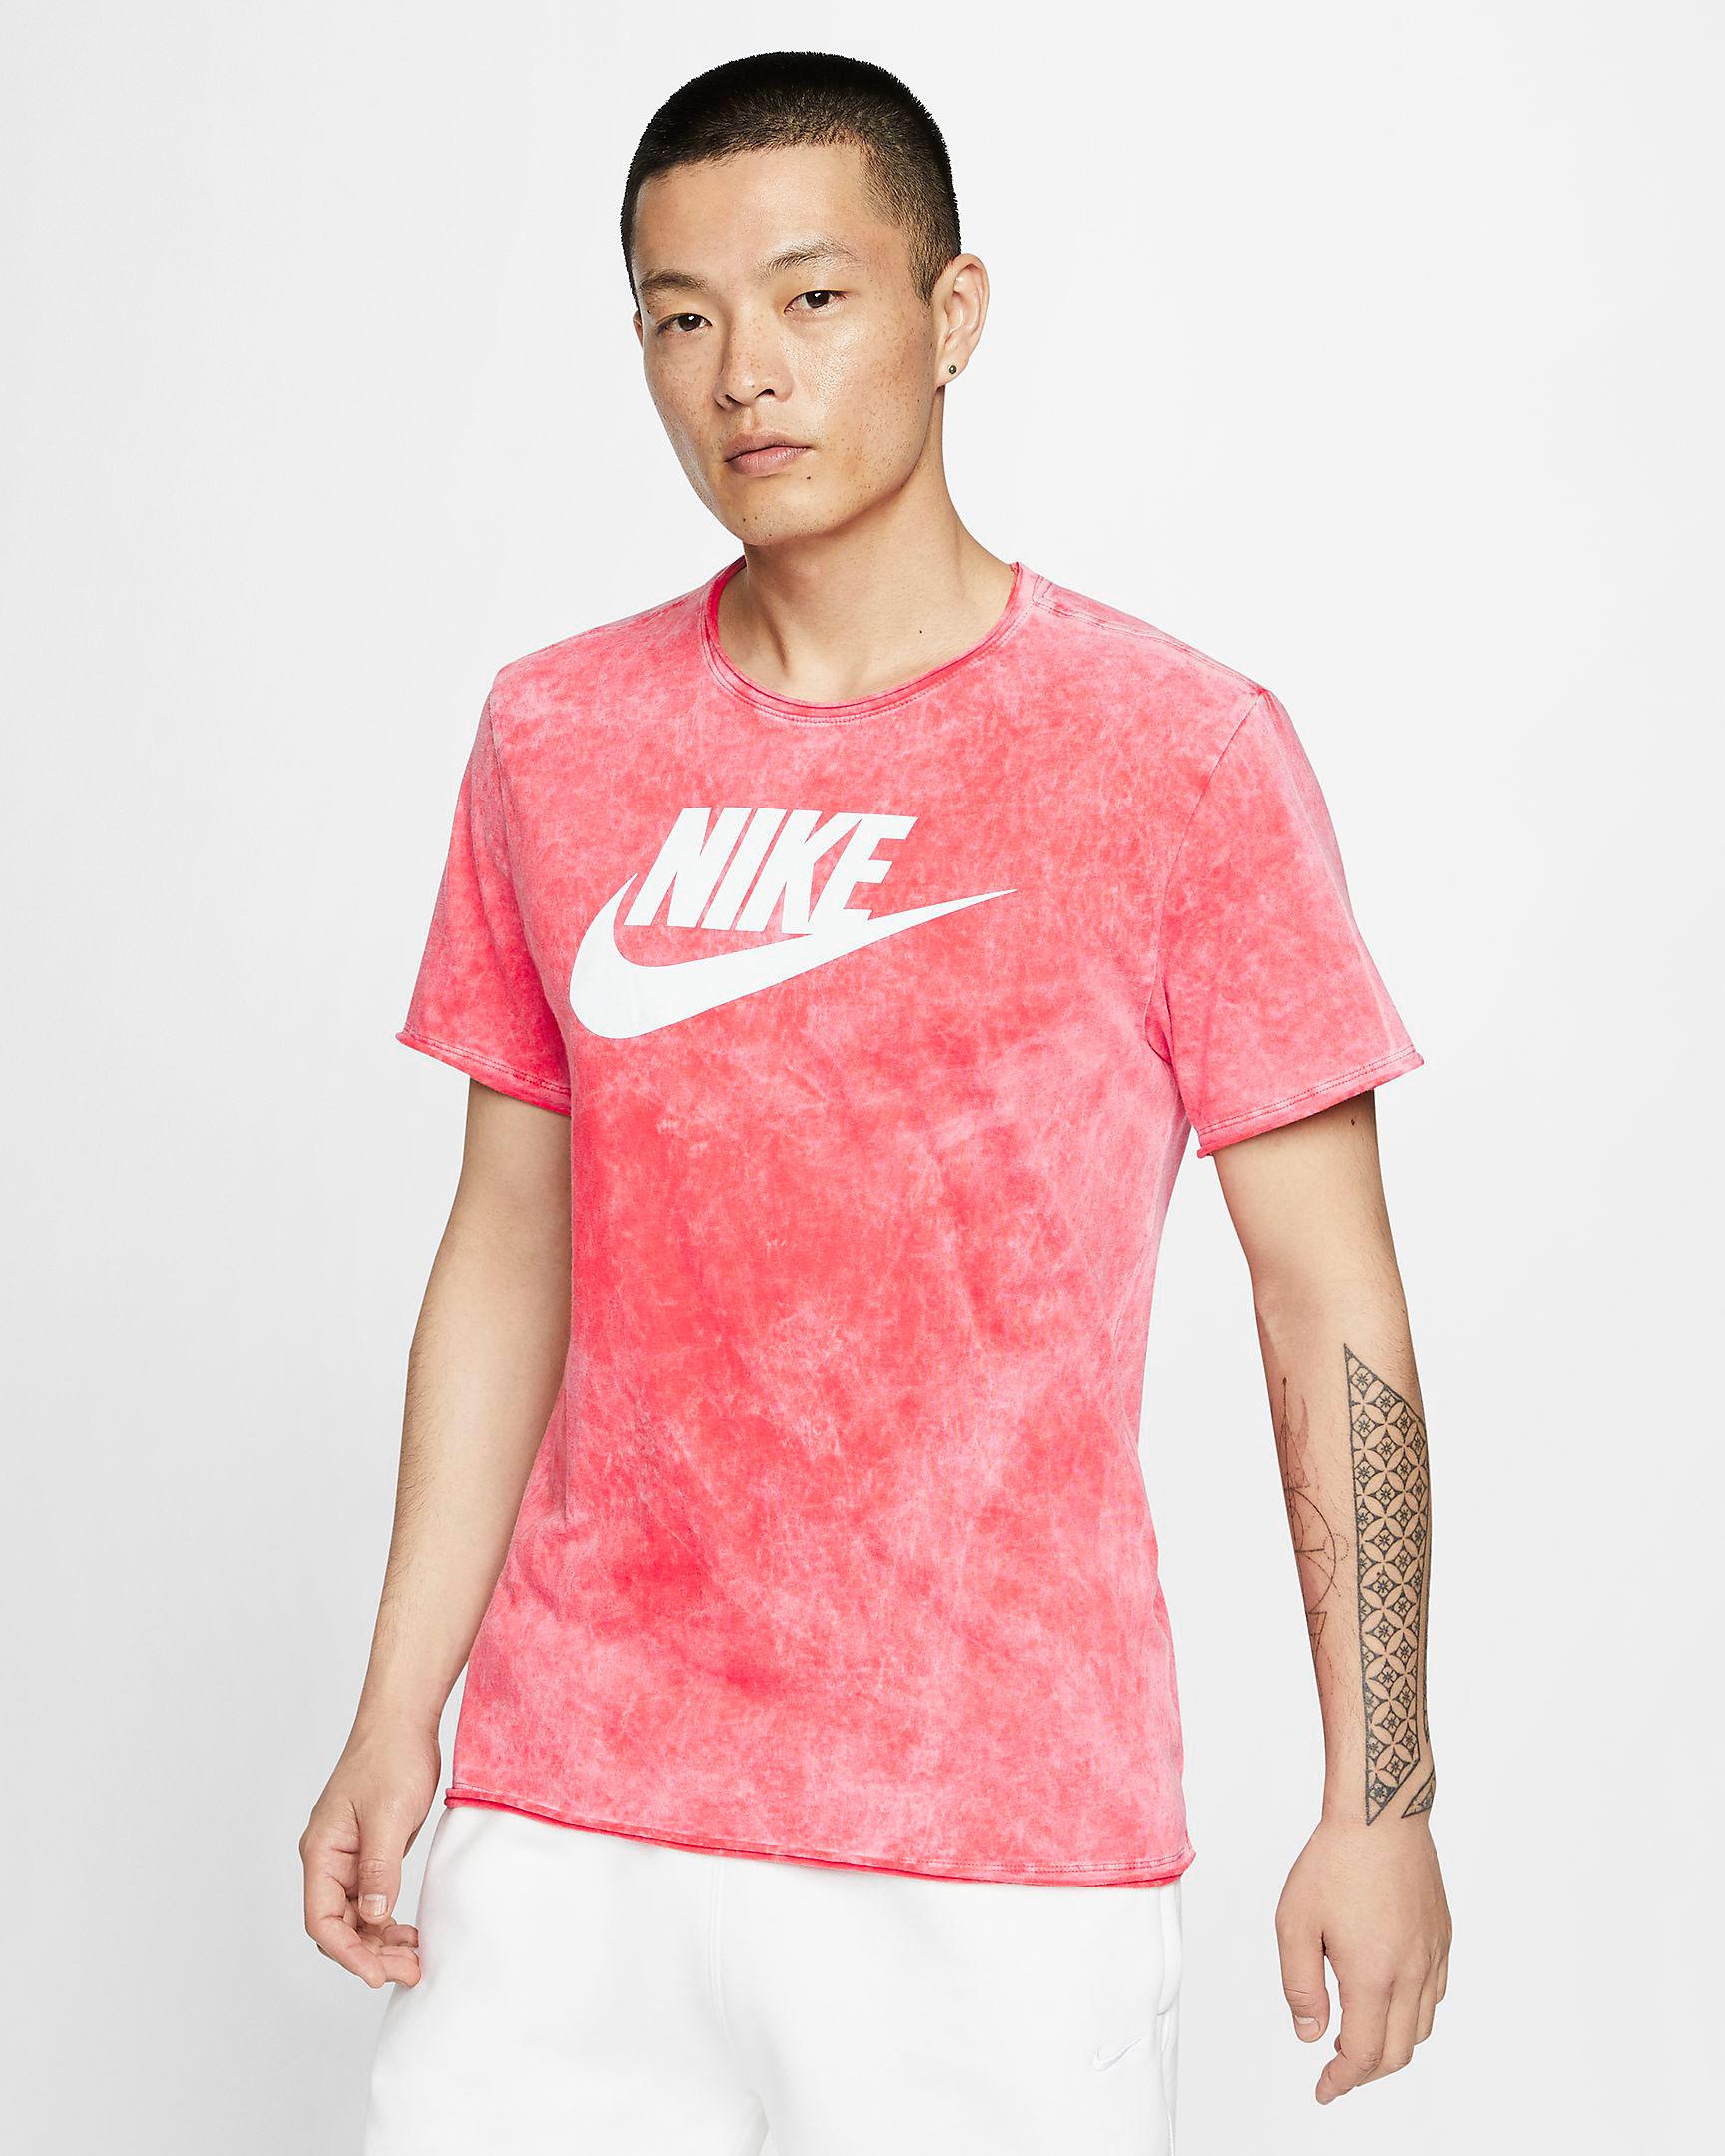 nike-sportswear-shirt-red-acid-wash